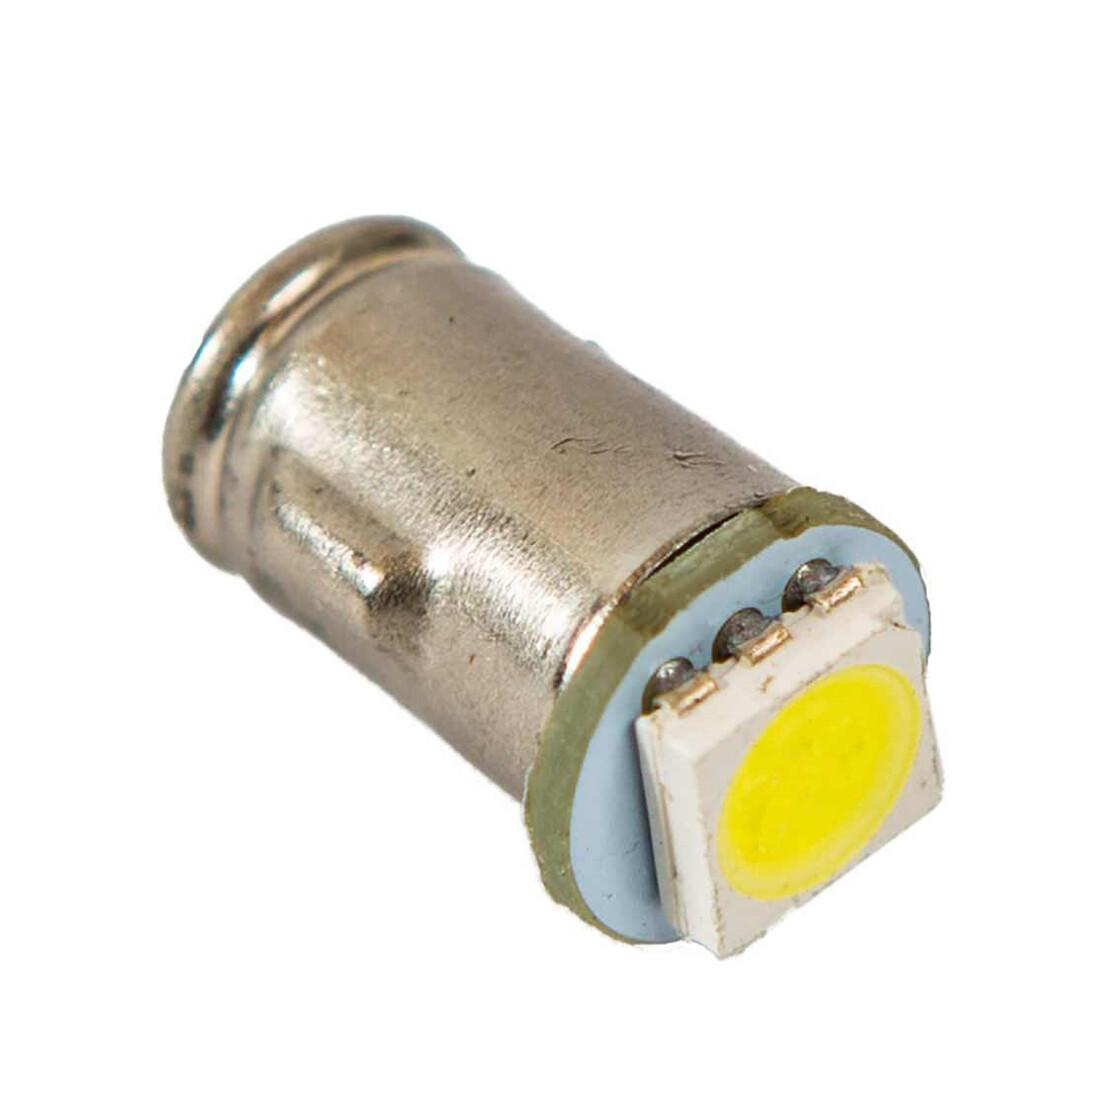 Armaturen Beleuchtung | T1 Led Leuchtmittel Instrumentenbeleuchtung Armaturenbeleuchtung 12